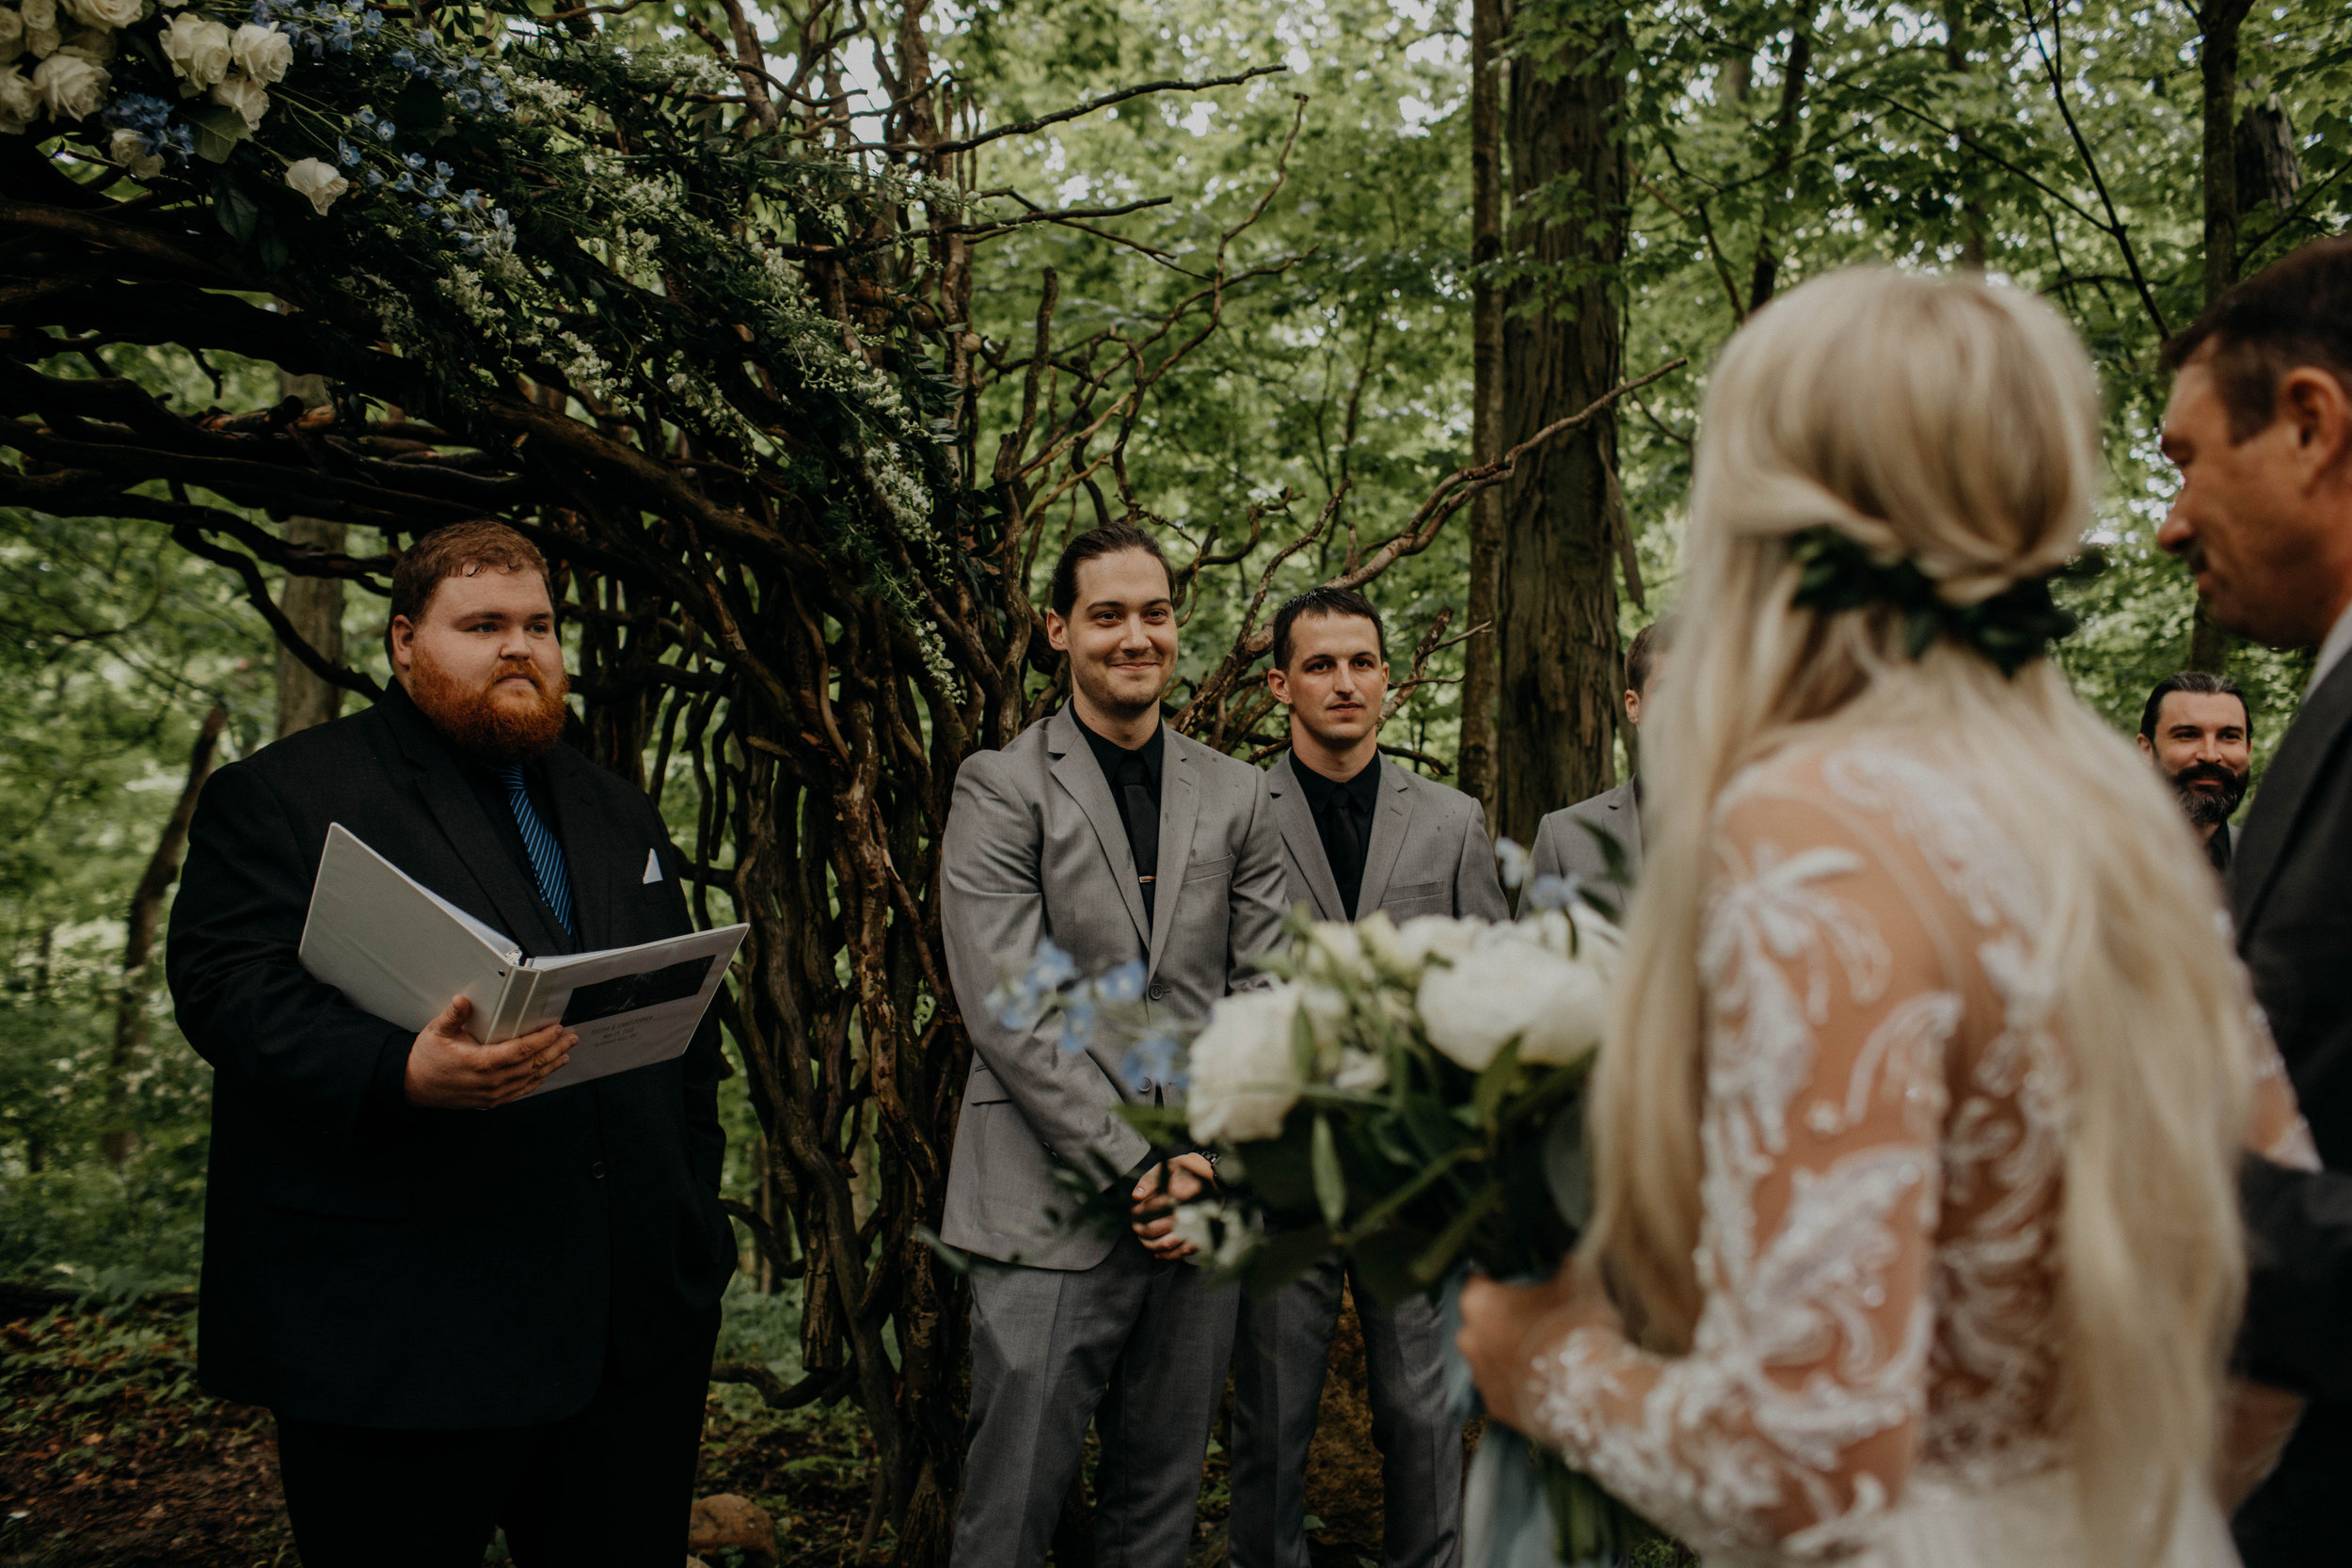 Columbus ohio wedding photographer canyon run ranch wedding grace e jones photography wedding photographer87.jpg